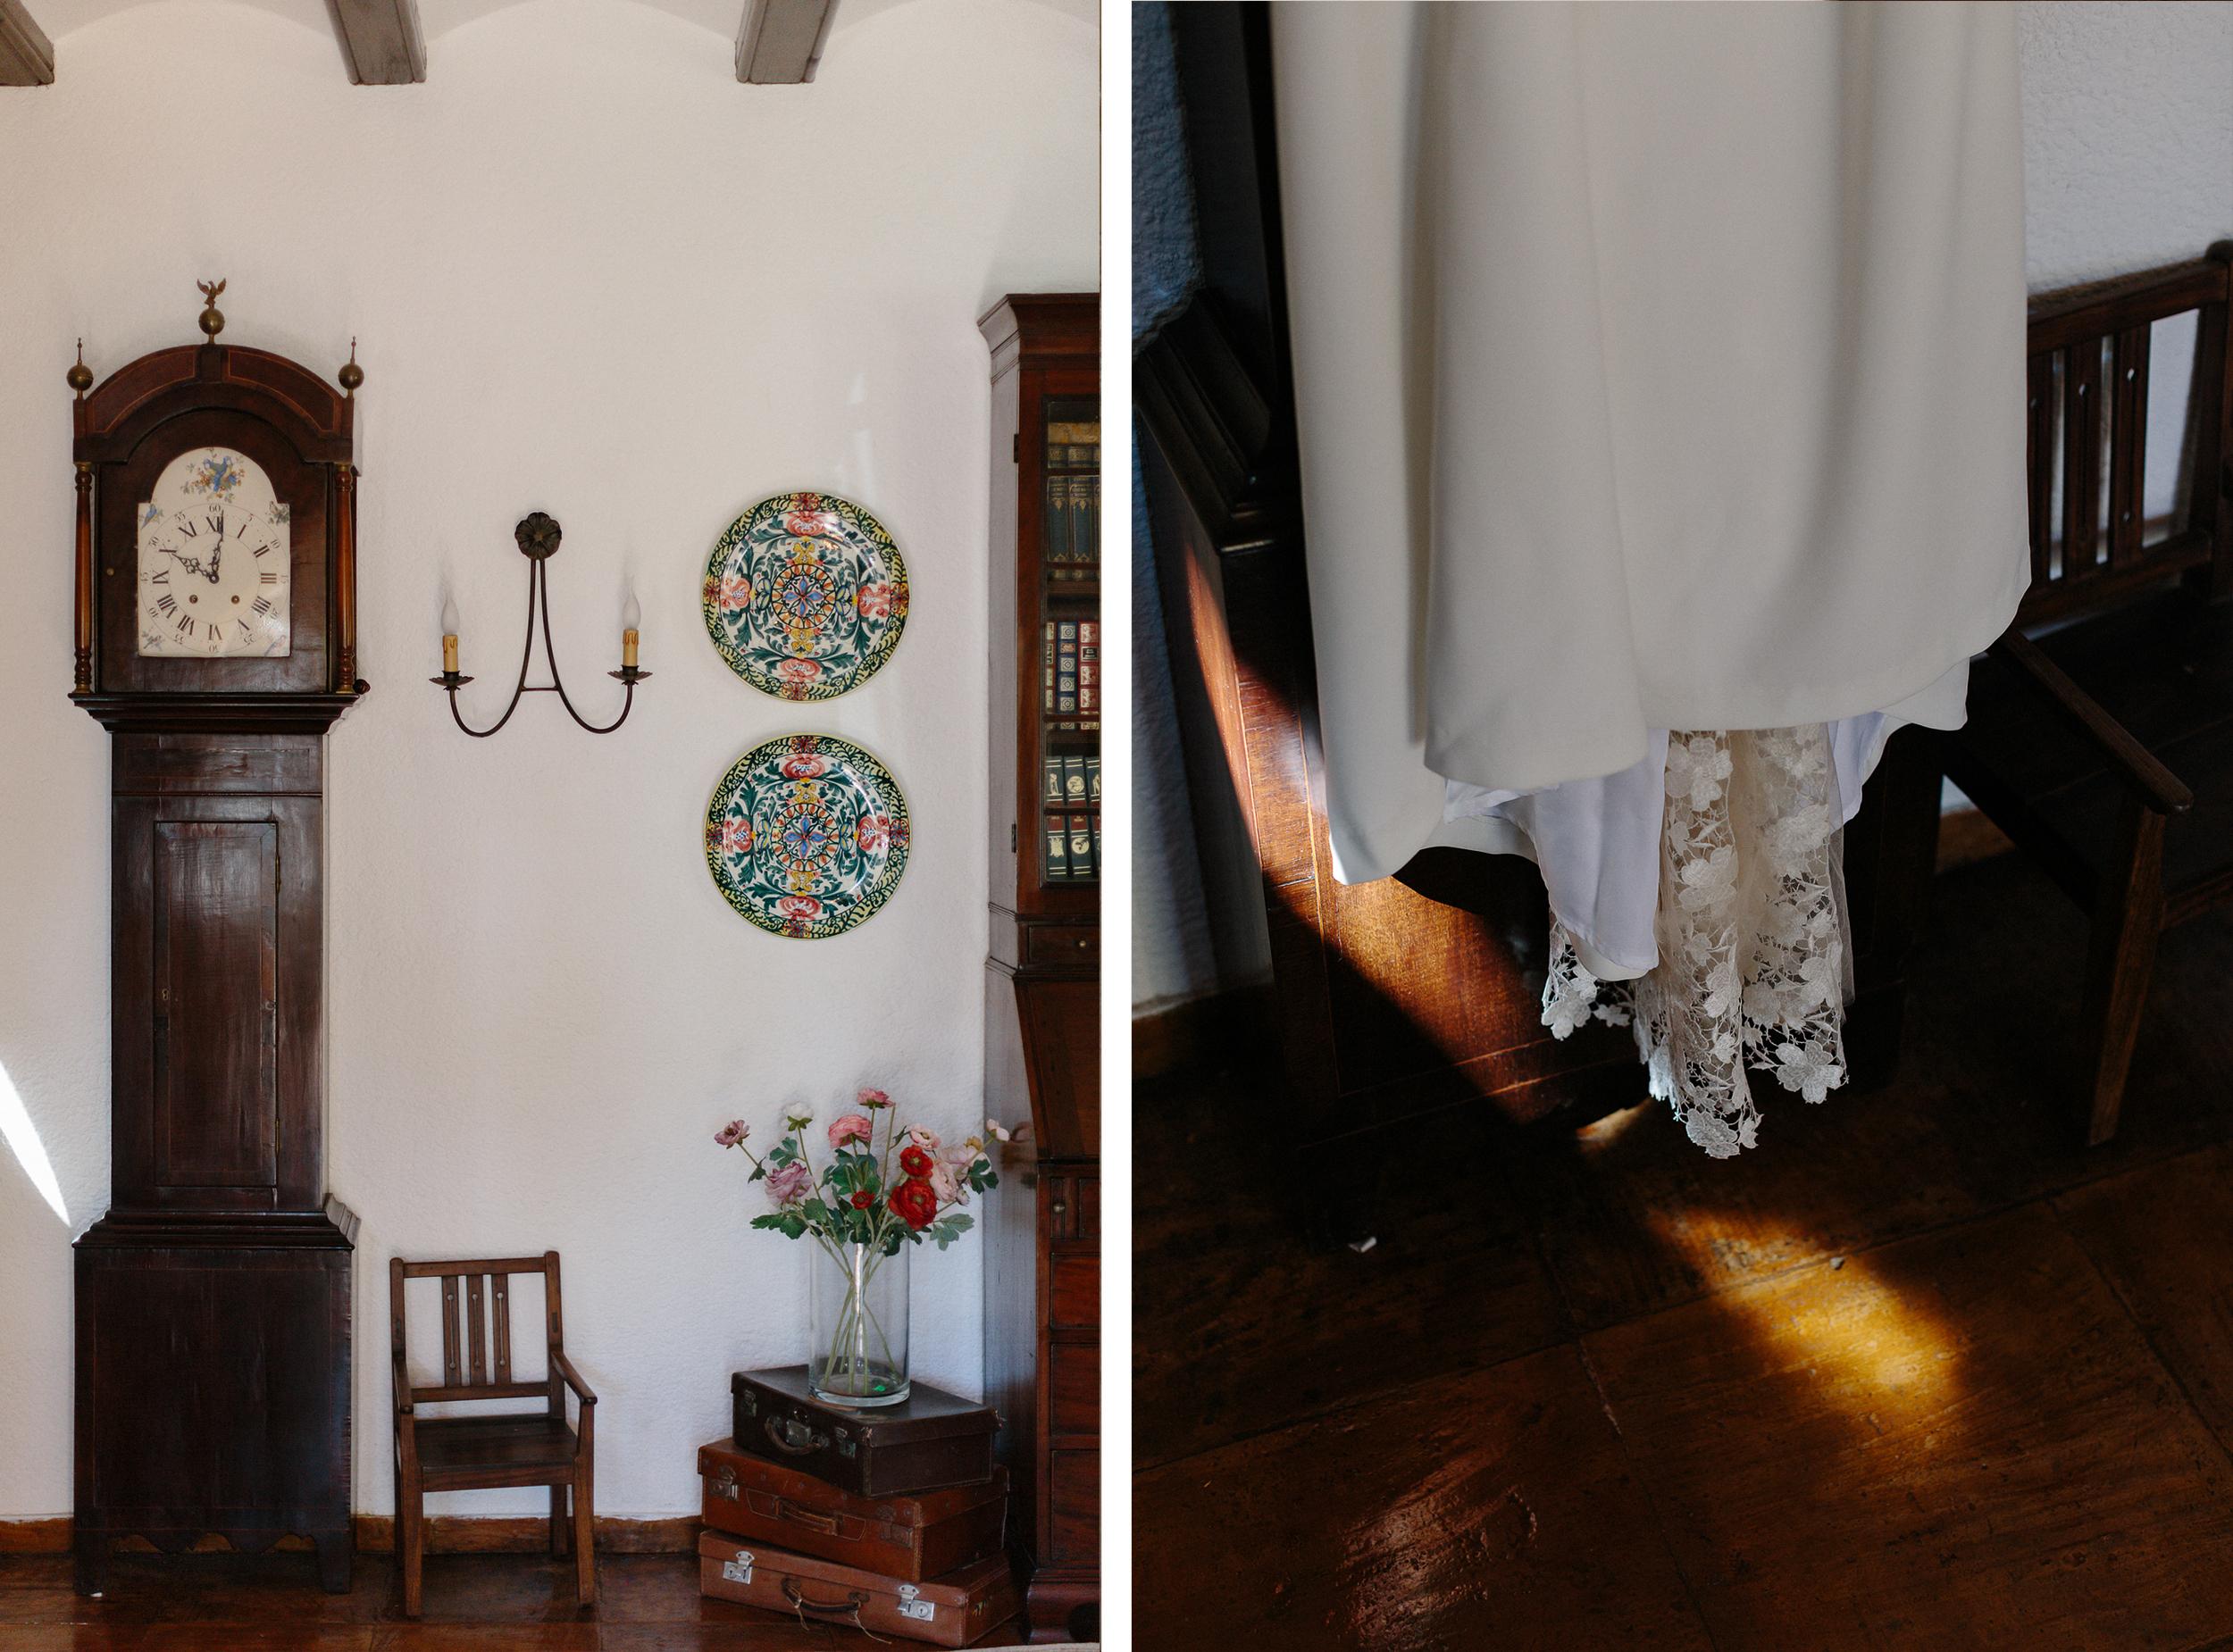 spread-2-european-wedding-spain-wedding-photographer-destination-wedding-photographer-from-toronto-ryanne-hollies-photography-documentary-editorial-style-toronto-wedding-photographer-getting-ready-details-vintage-lace-wedding-dress-bridal.jpg